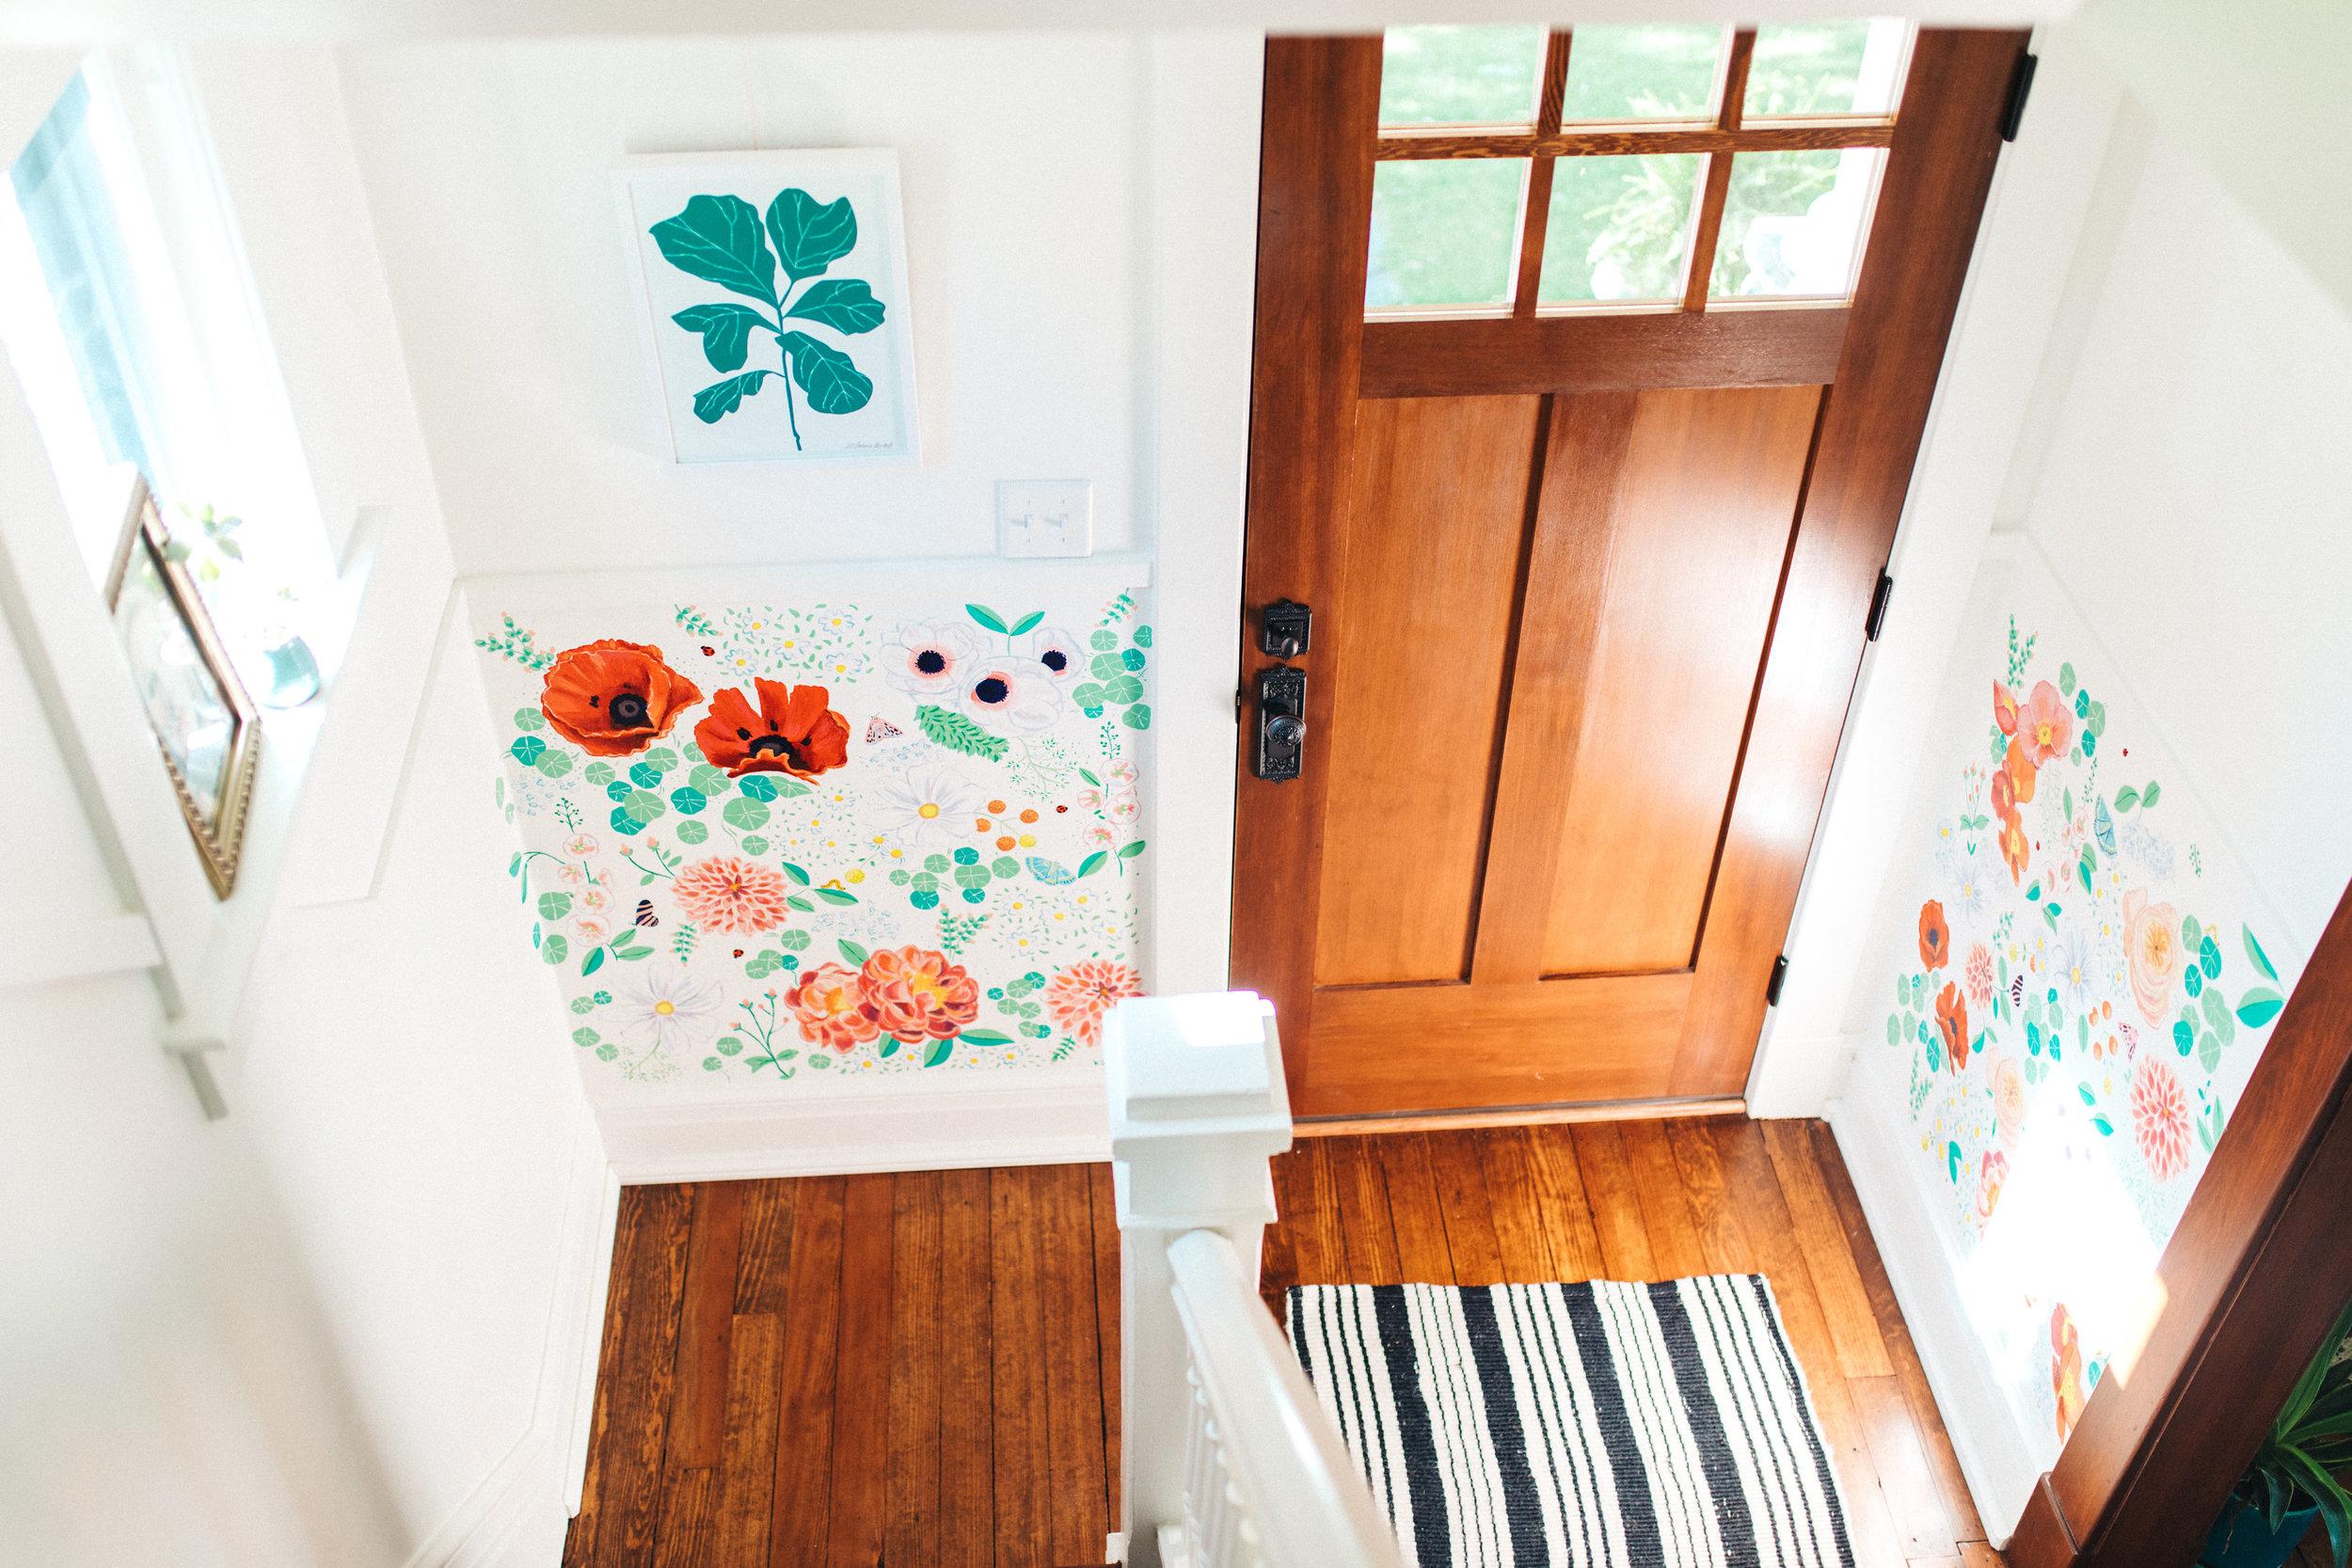 tb-home-mural-51.jpg